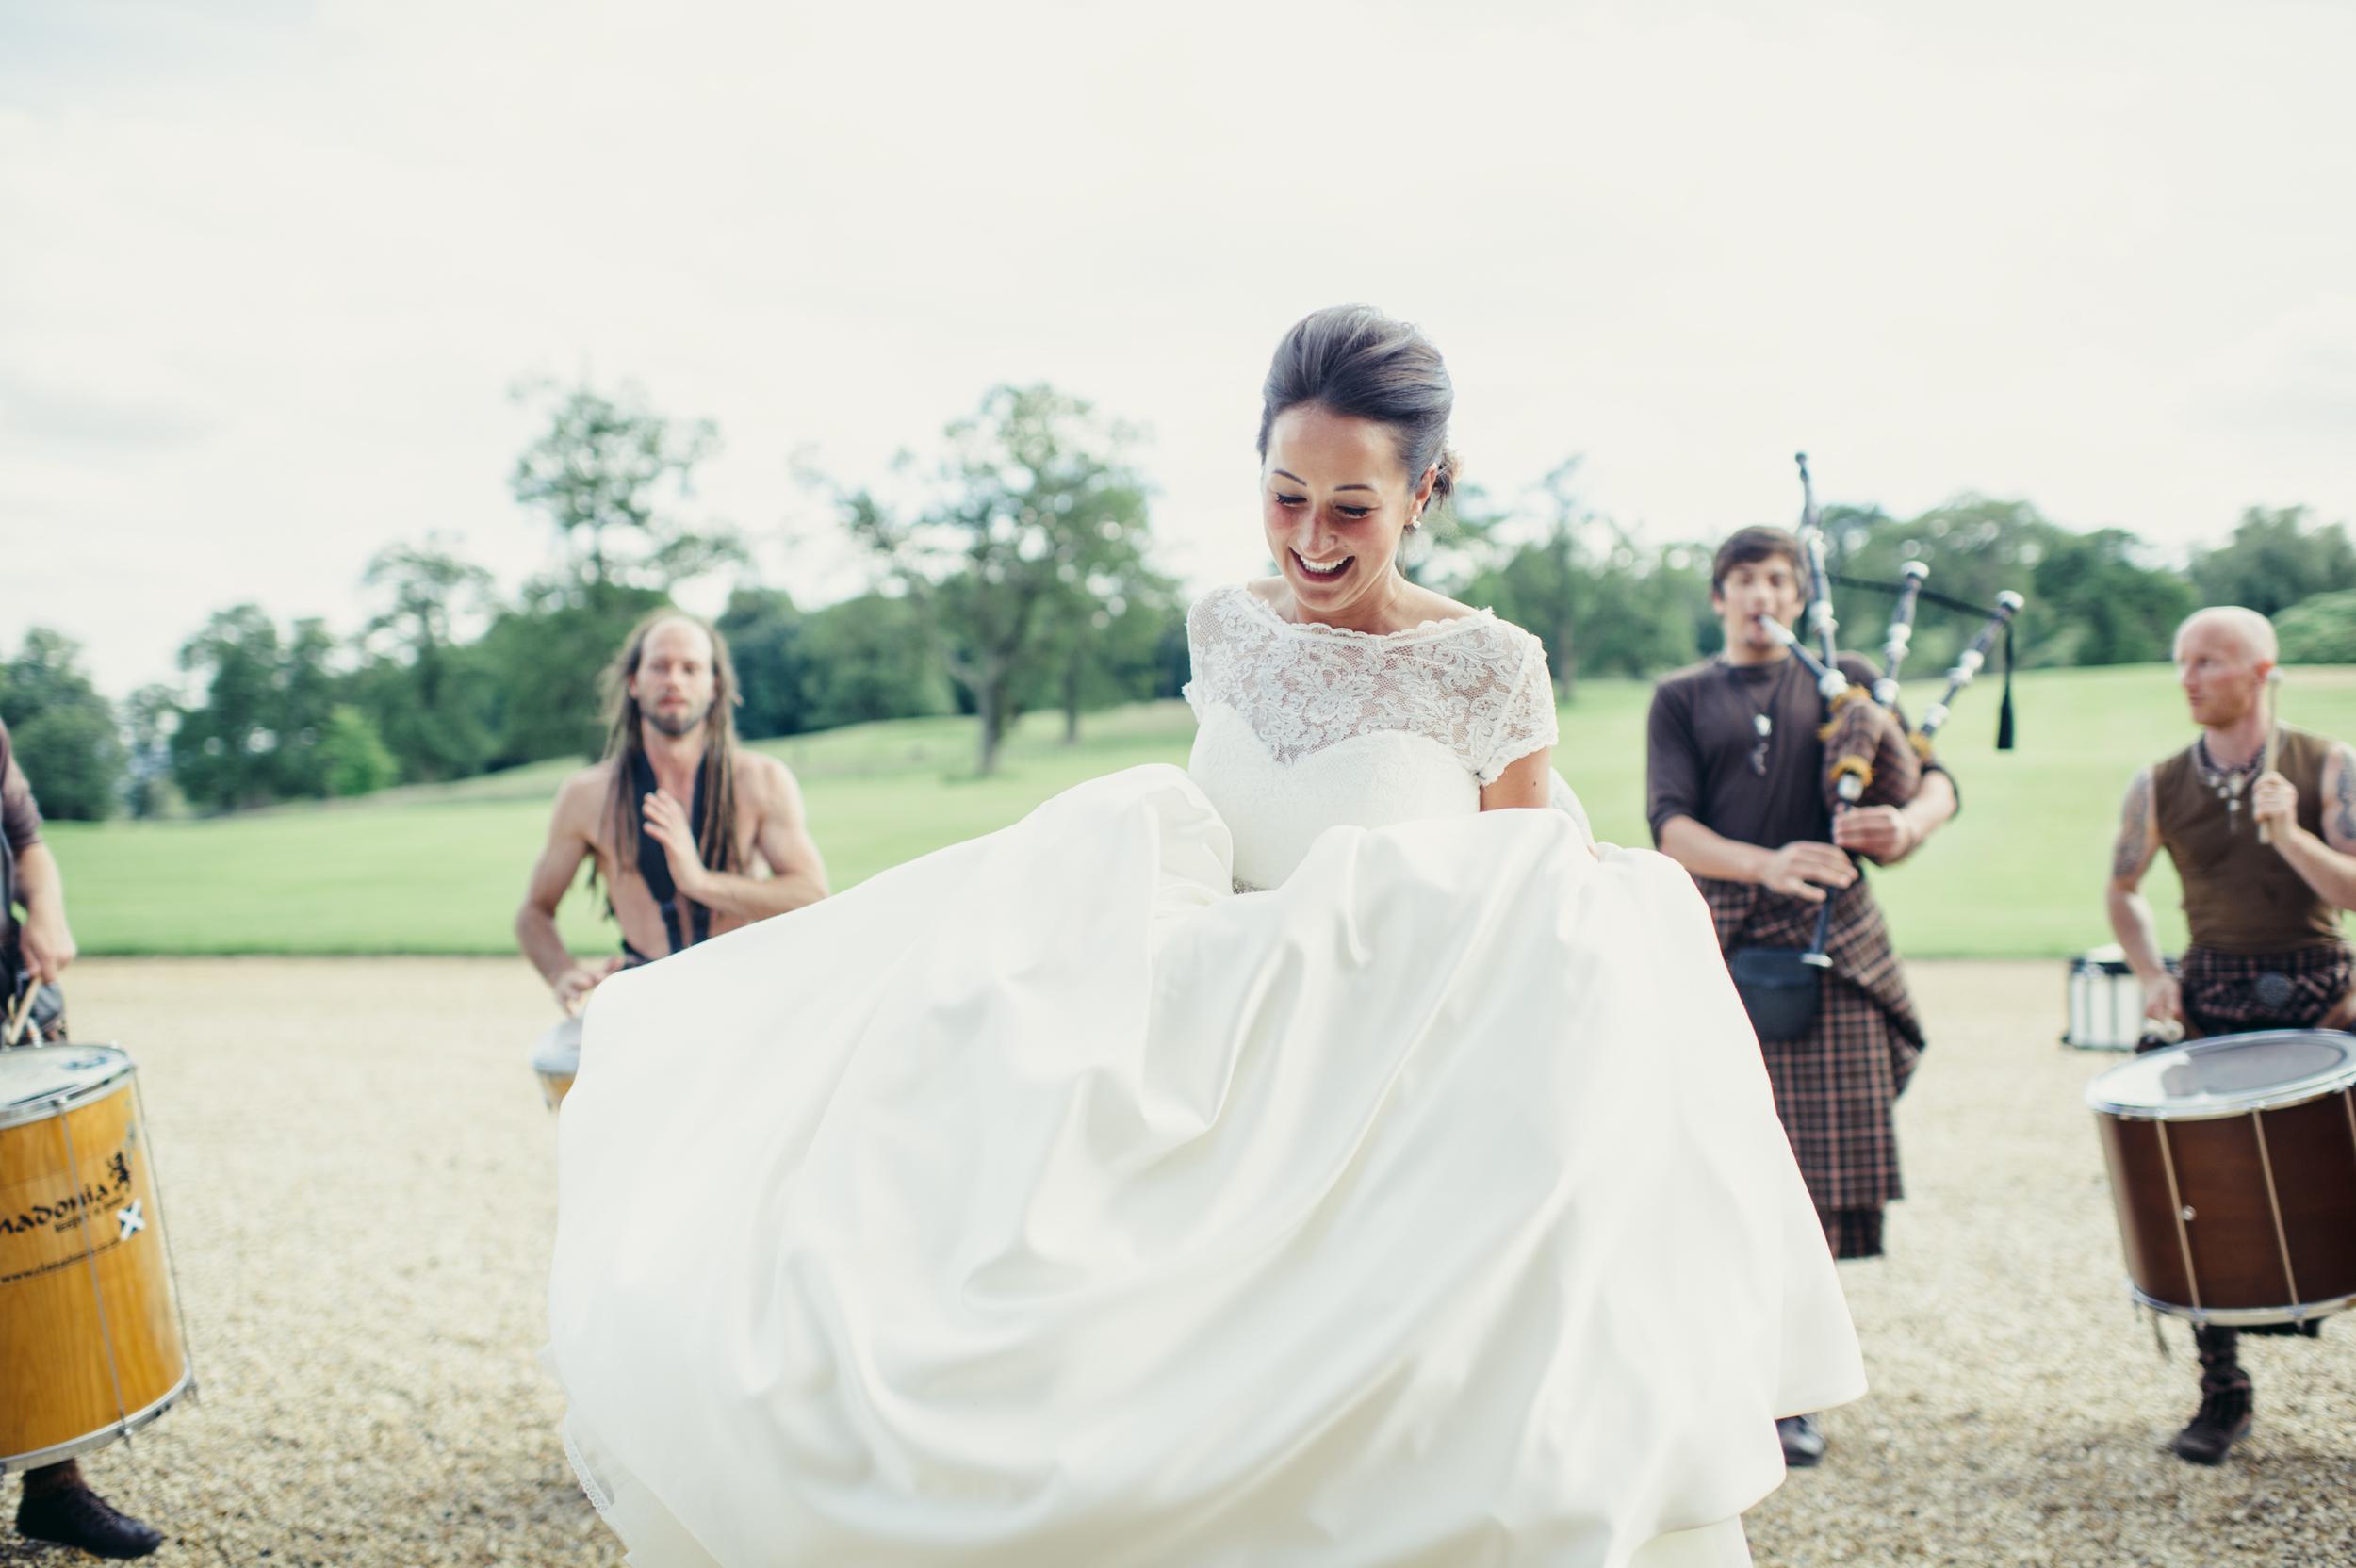 0142-lisa-devine-alternative-creative-wedding-photography-glasgow-edinburgh.JPG